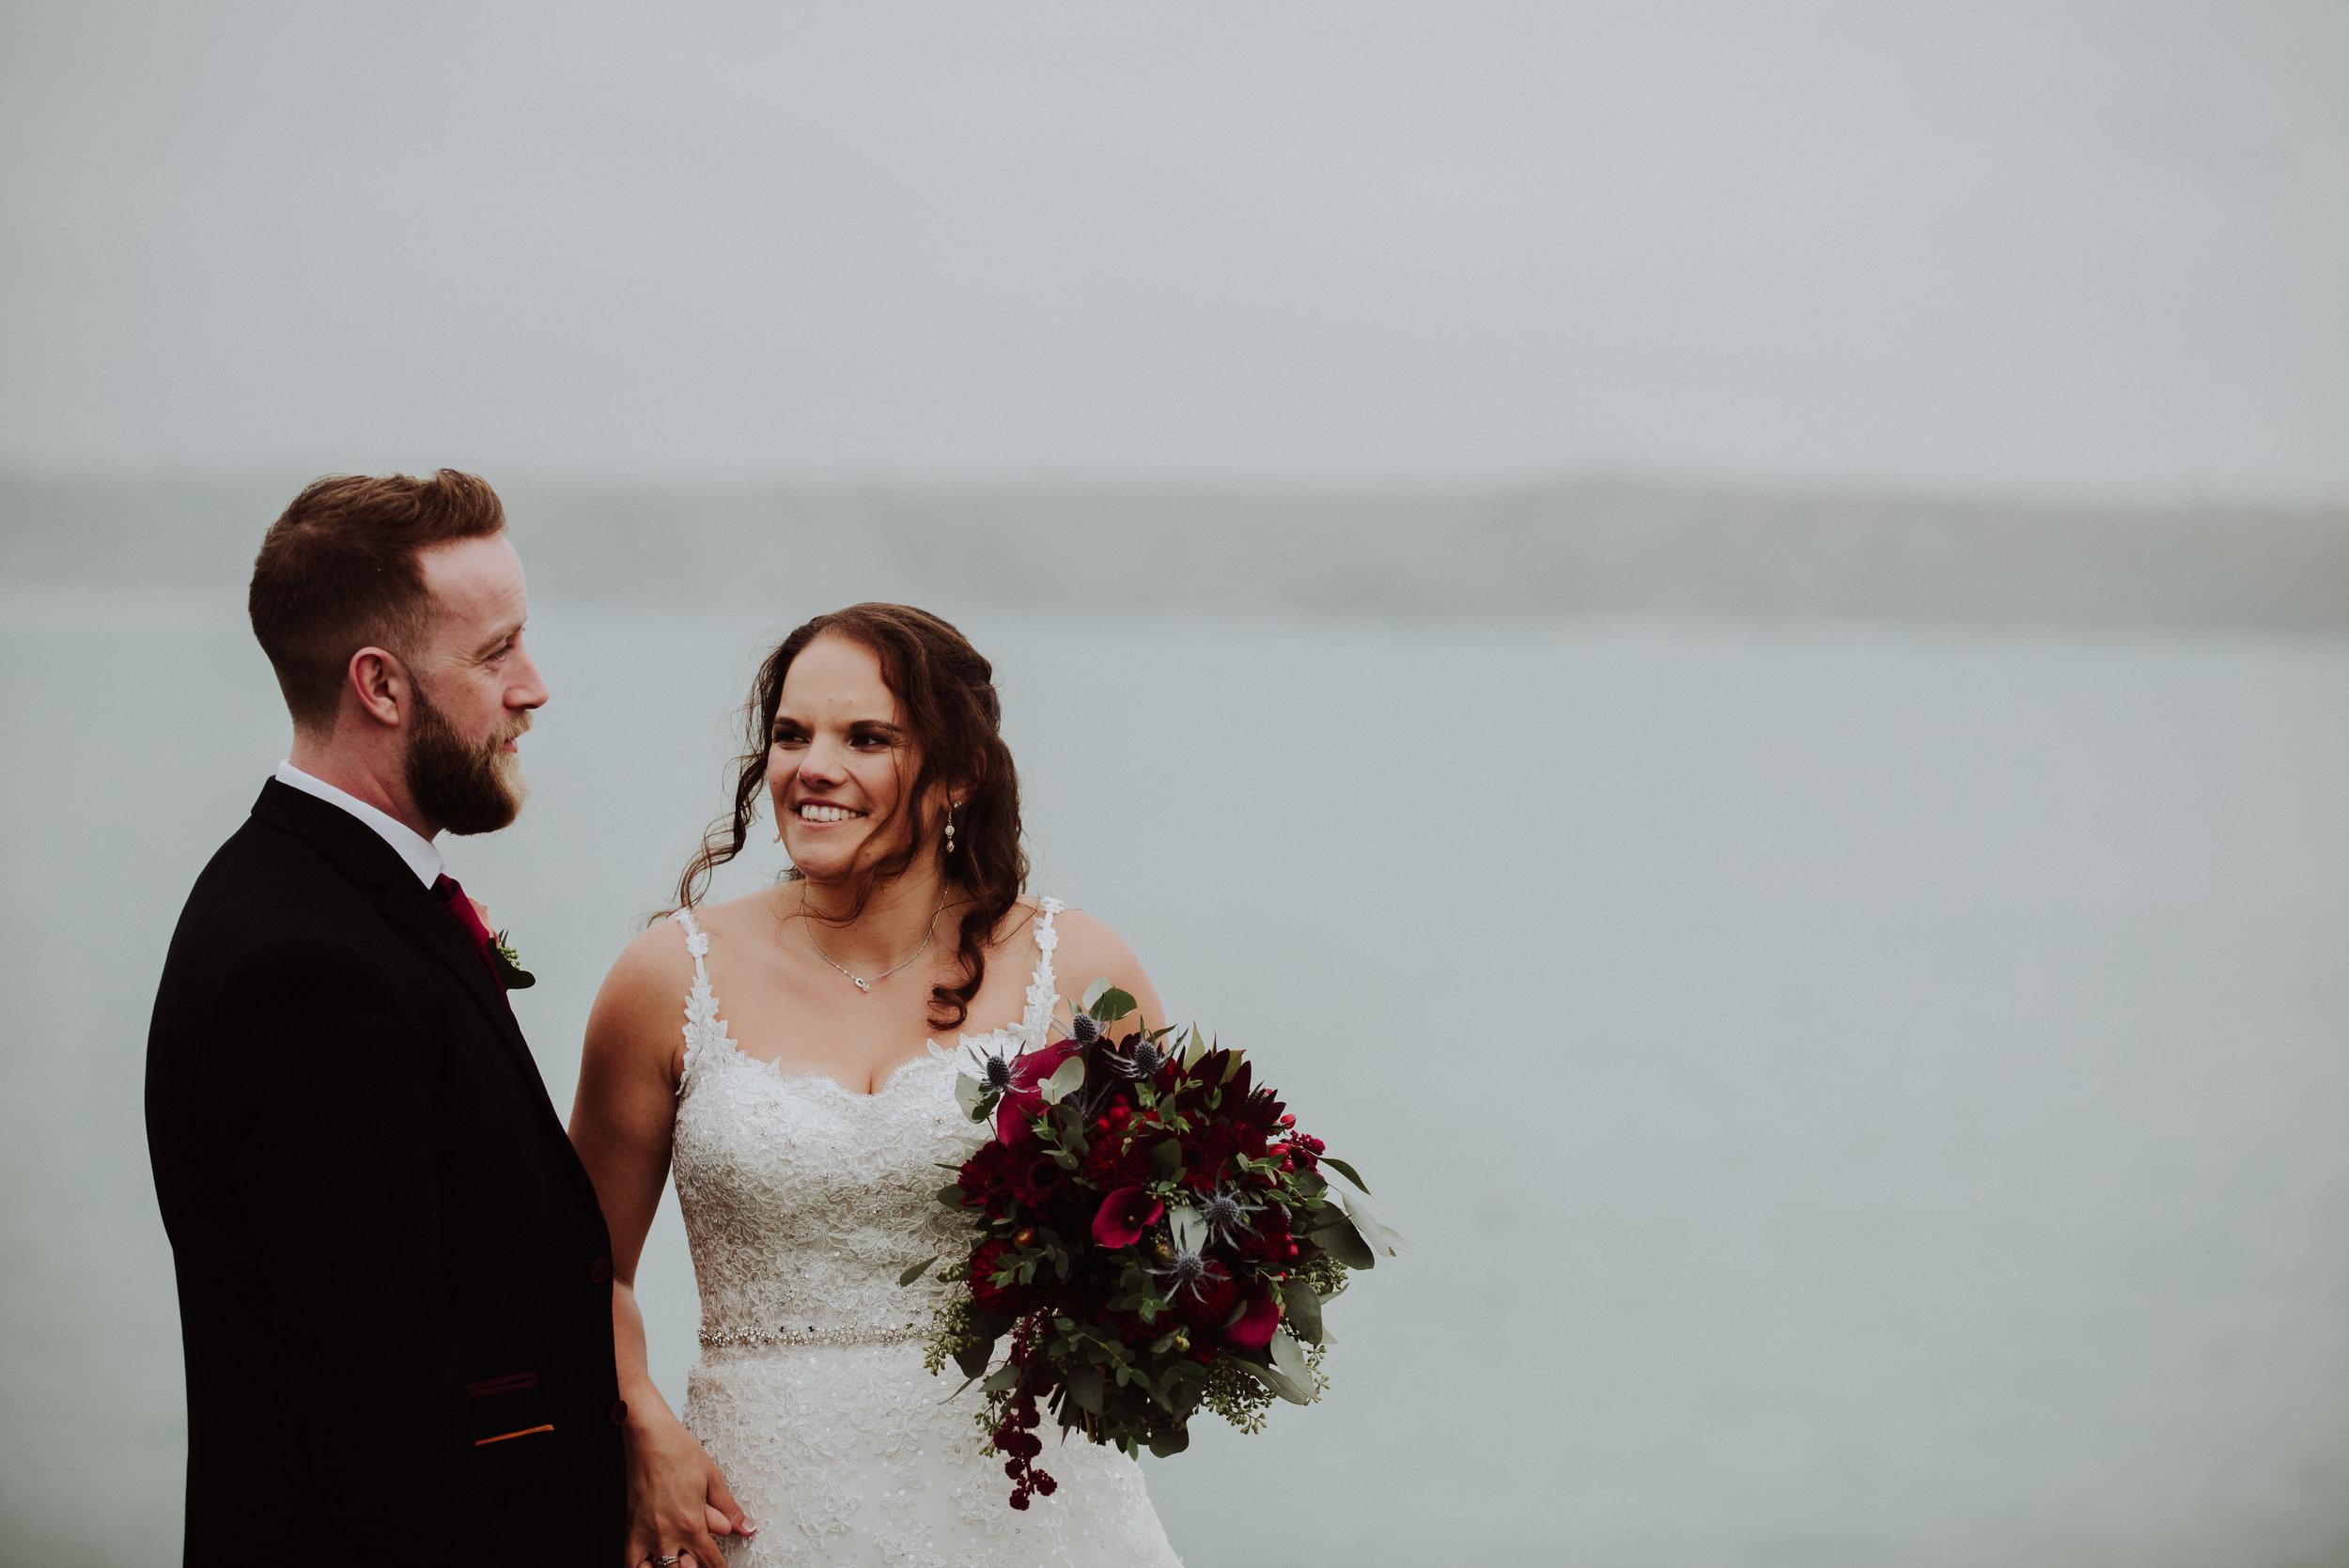 wedding-photographer-cornwall-carnmarth-hotel-newquay-6.jpg